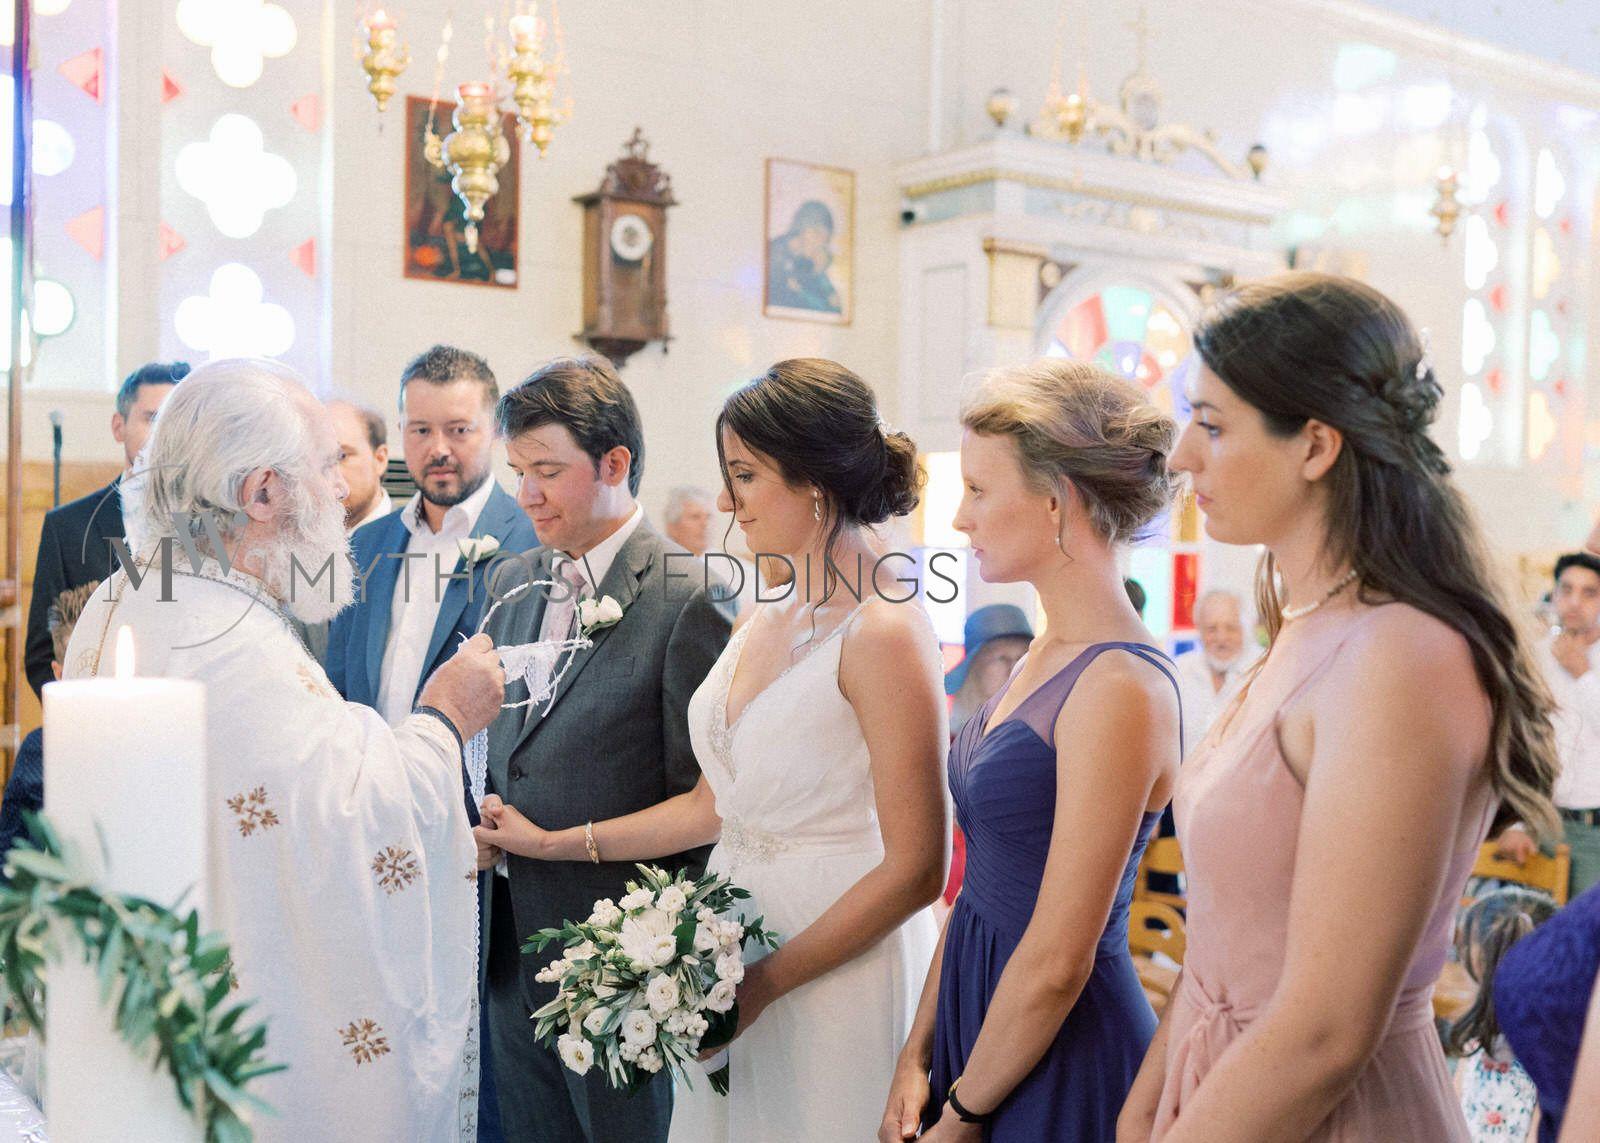 WeddingN+S08.09.18-201